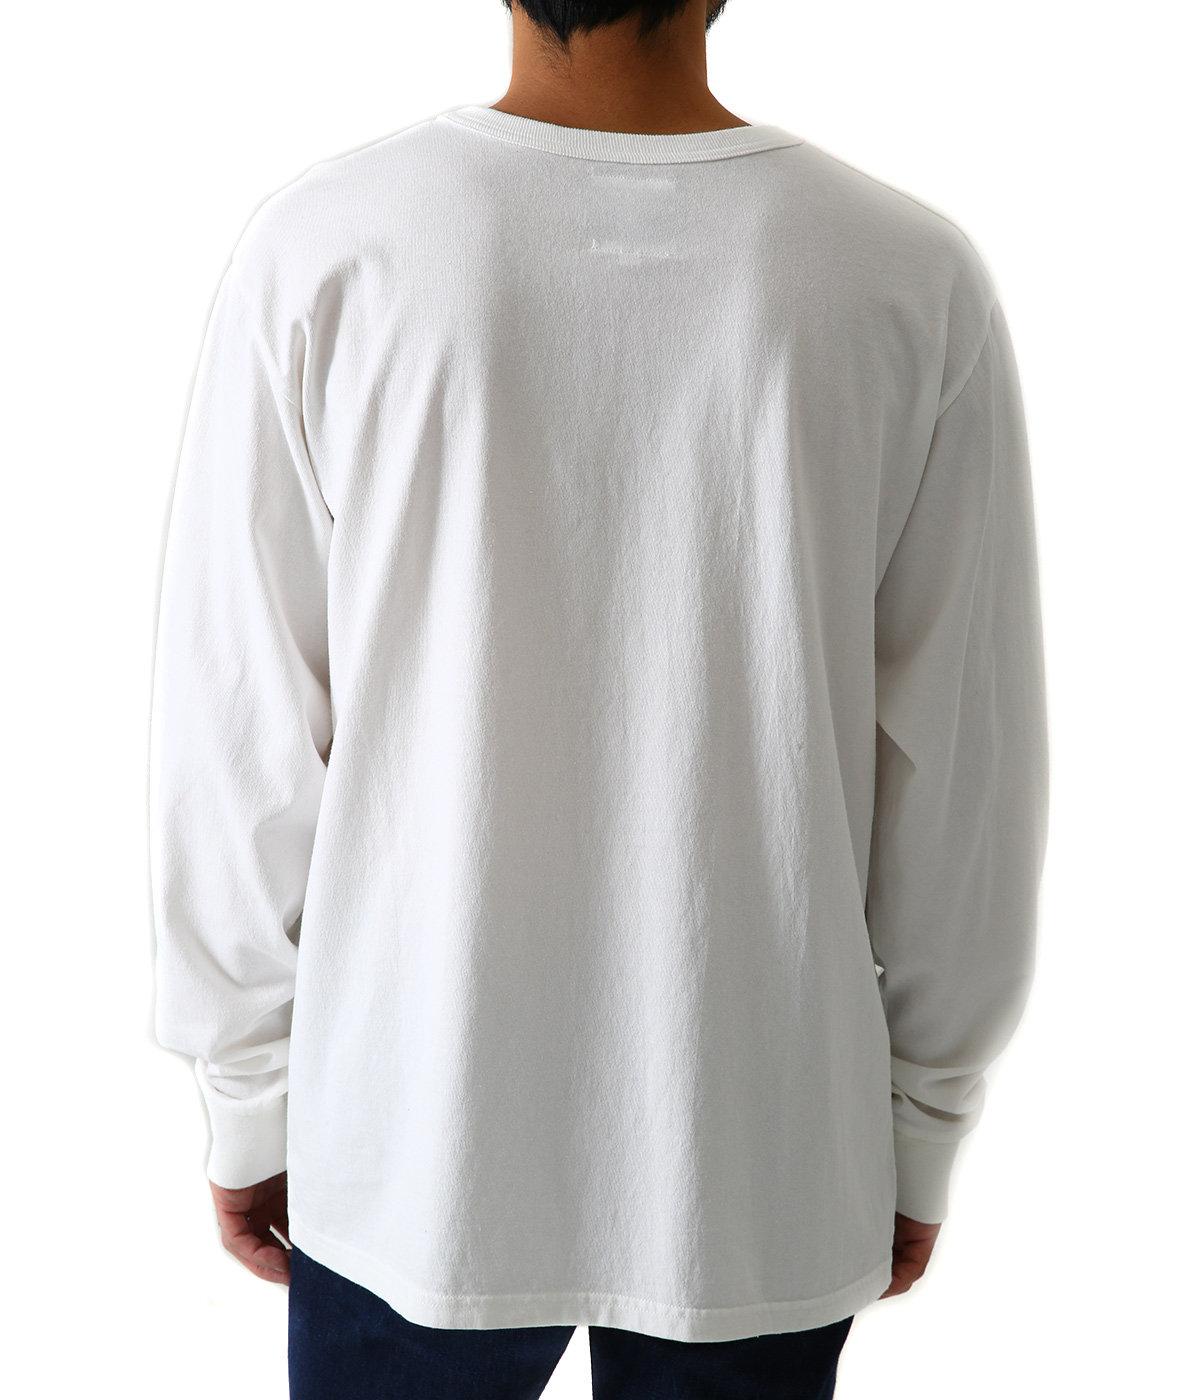 HANDWRITING LOGO LS embroidery shirt